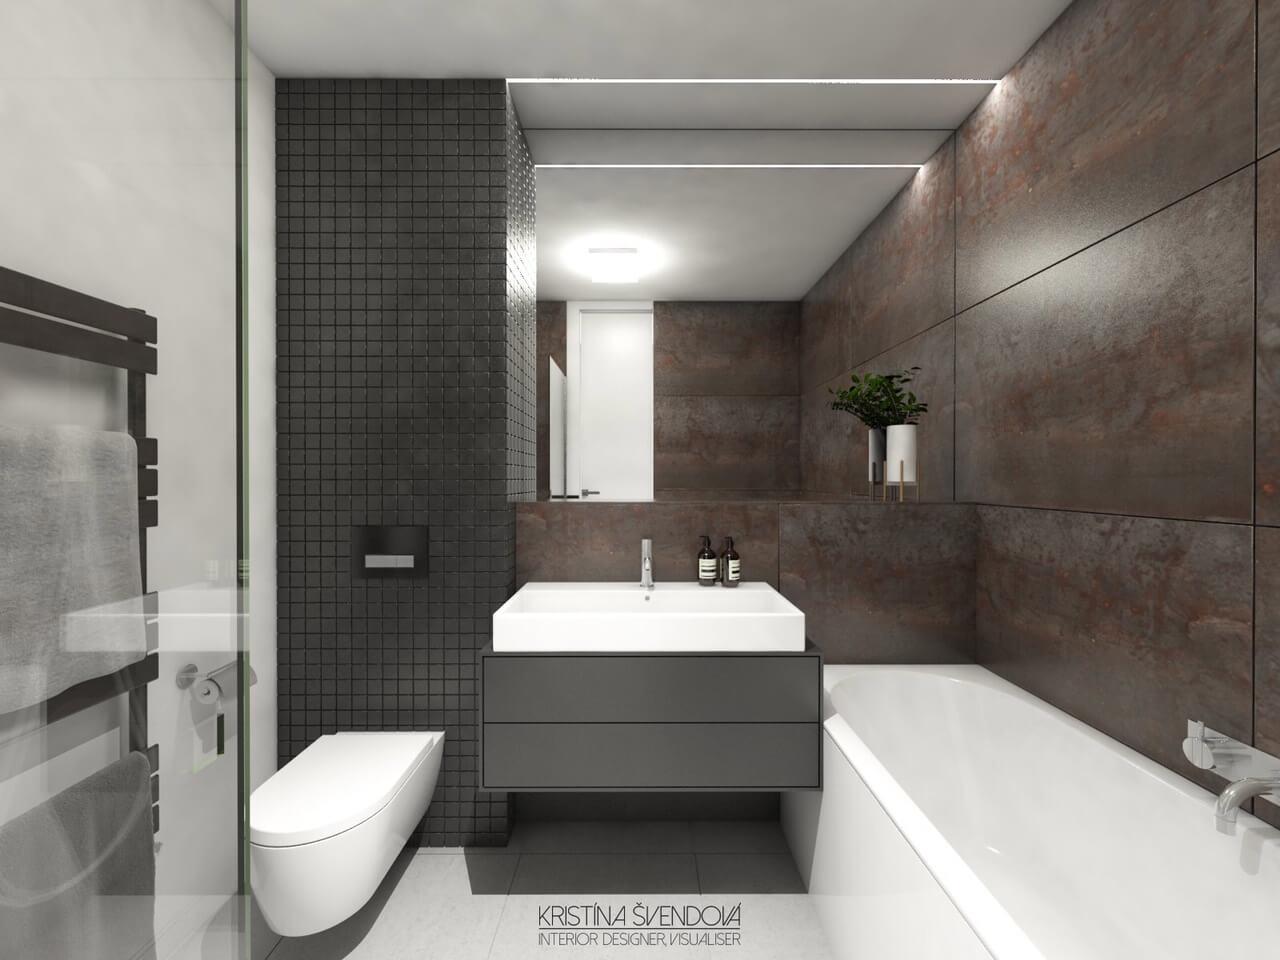 Predané: Exkluzívny 3- izbový byt v NOVOSTAVBE BA-NIVY, City Park, 71,24m2, balkón 8,5m2-7